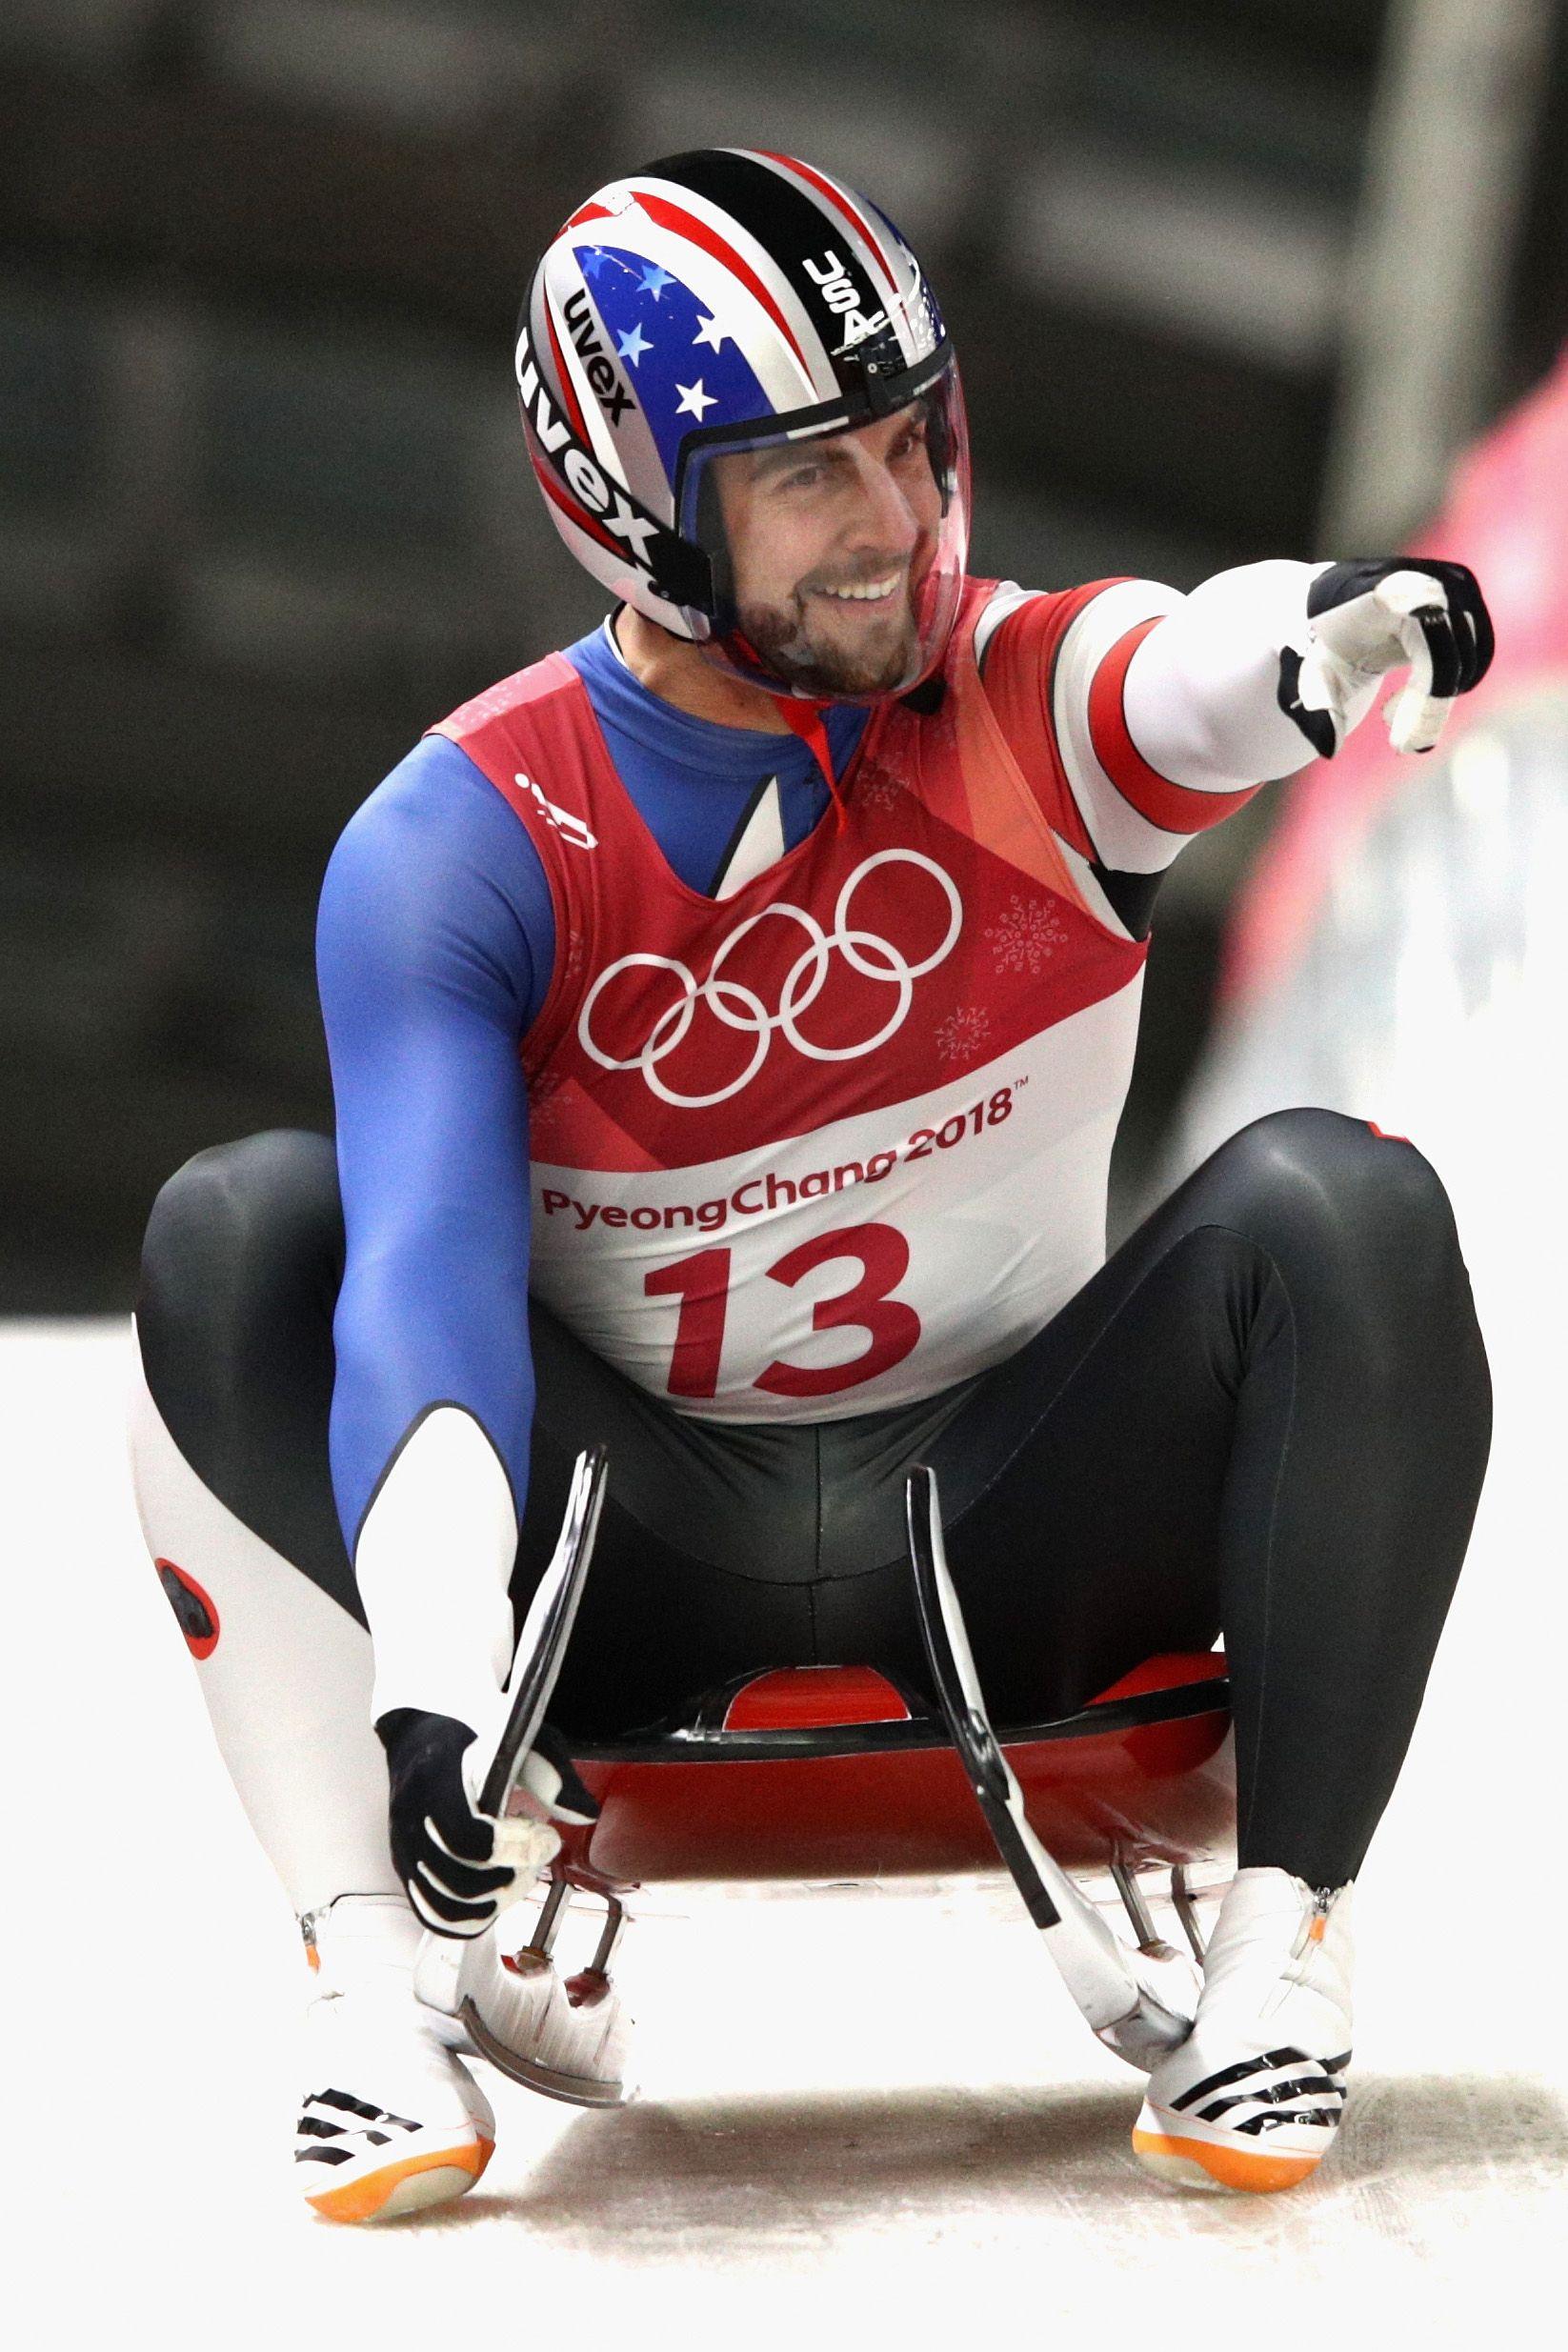 2018 winter olympics chris mazdzer